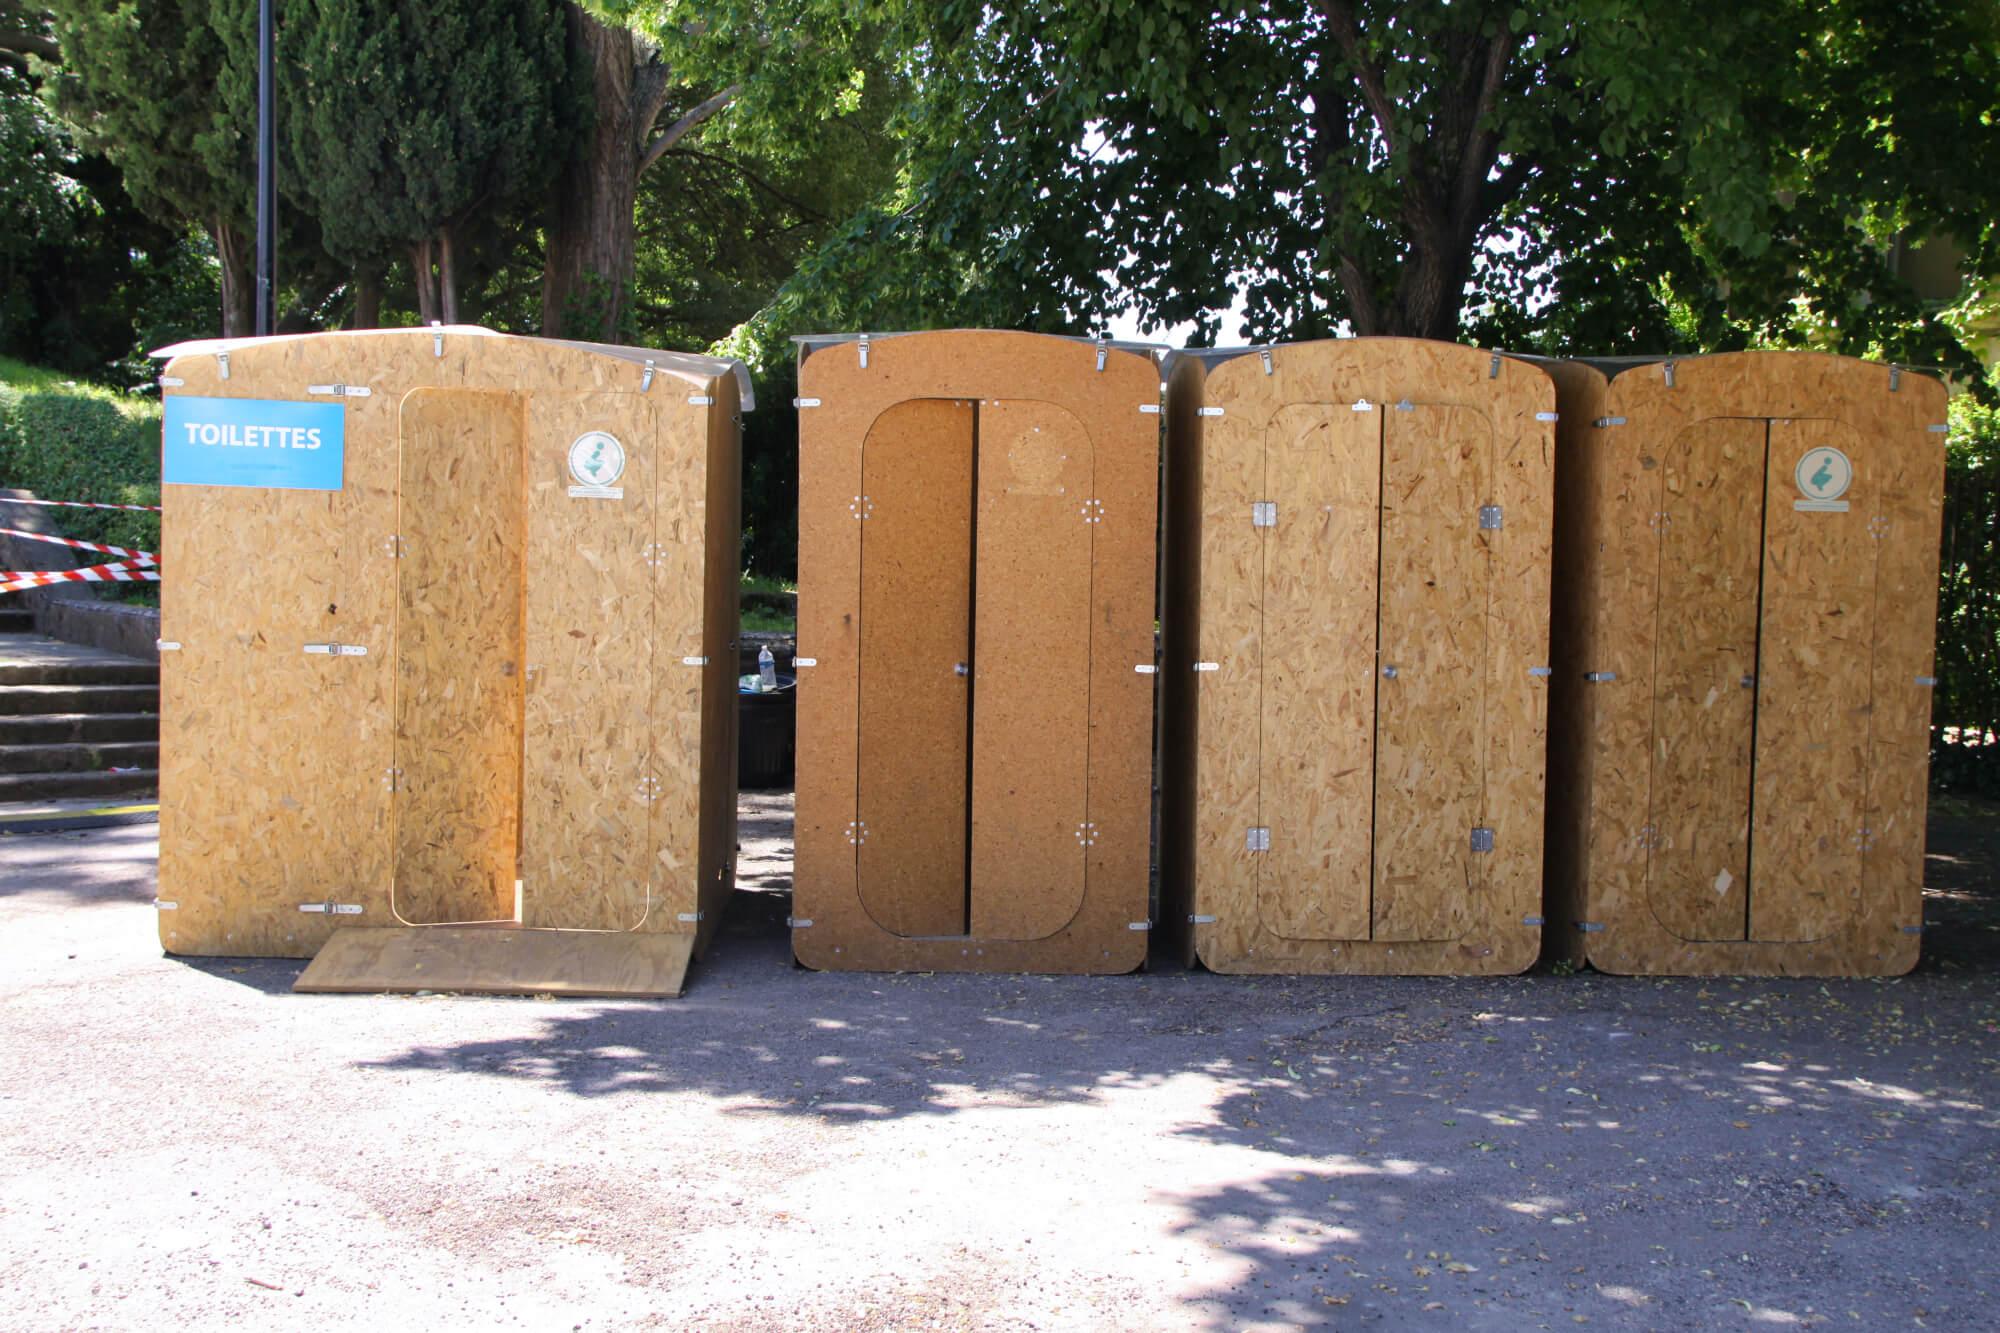 location toilettes sèches